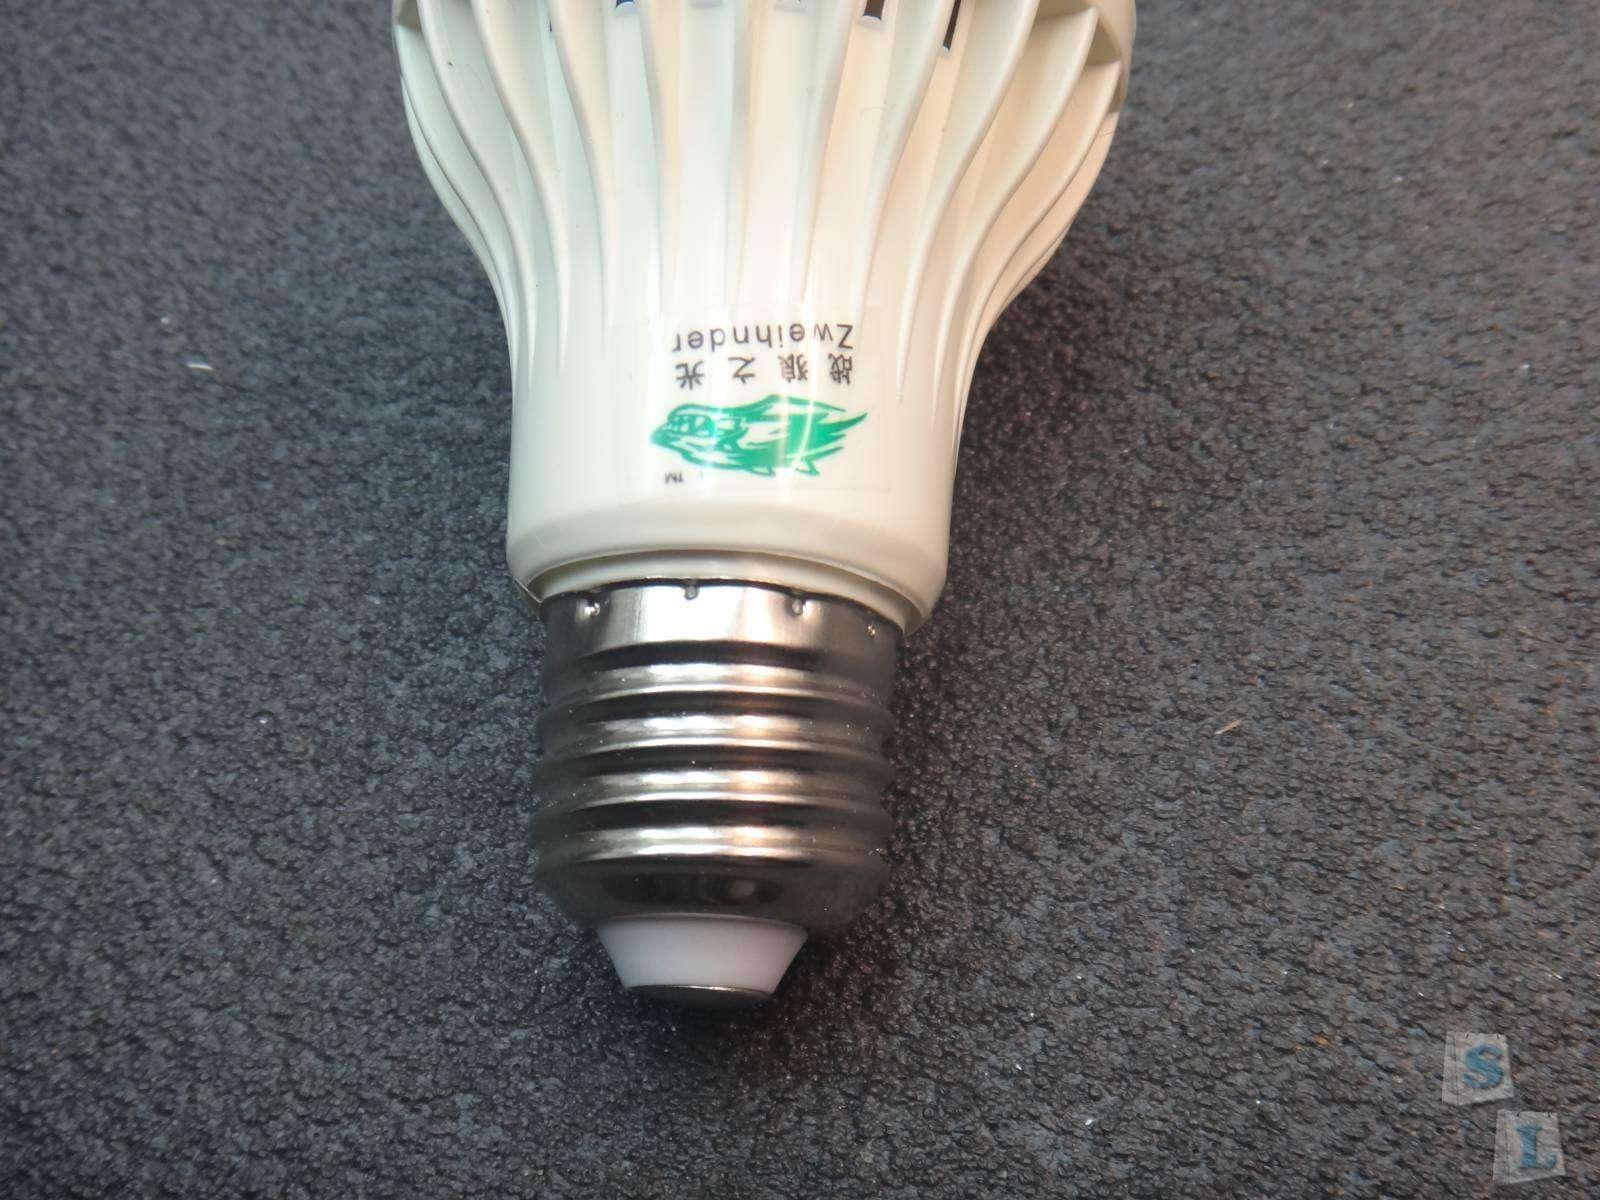 GearBest: Обзор и доработка LED ламп Zweihnder попытка избавиться от пульсаций